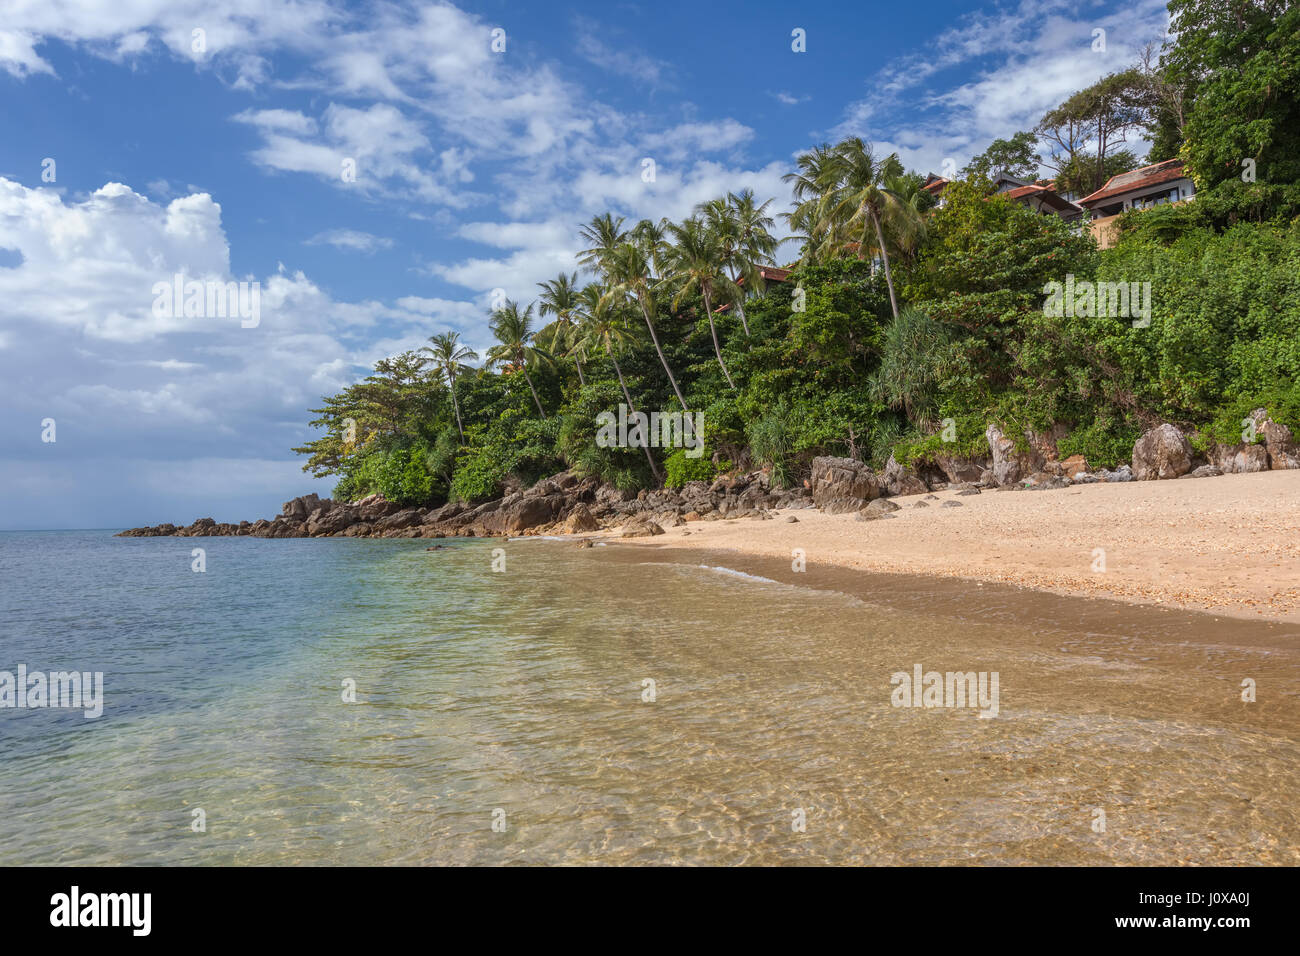 Klong Nin Beach in Koh Lanta Yai, Krabi Province, Thailand, Southeast Asia - Stock Image